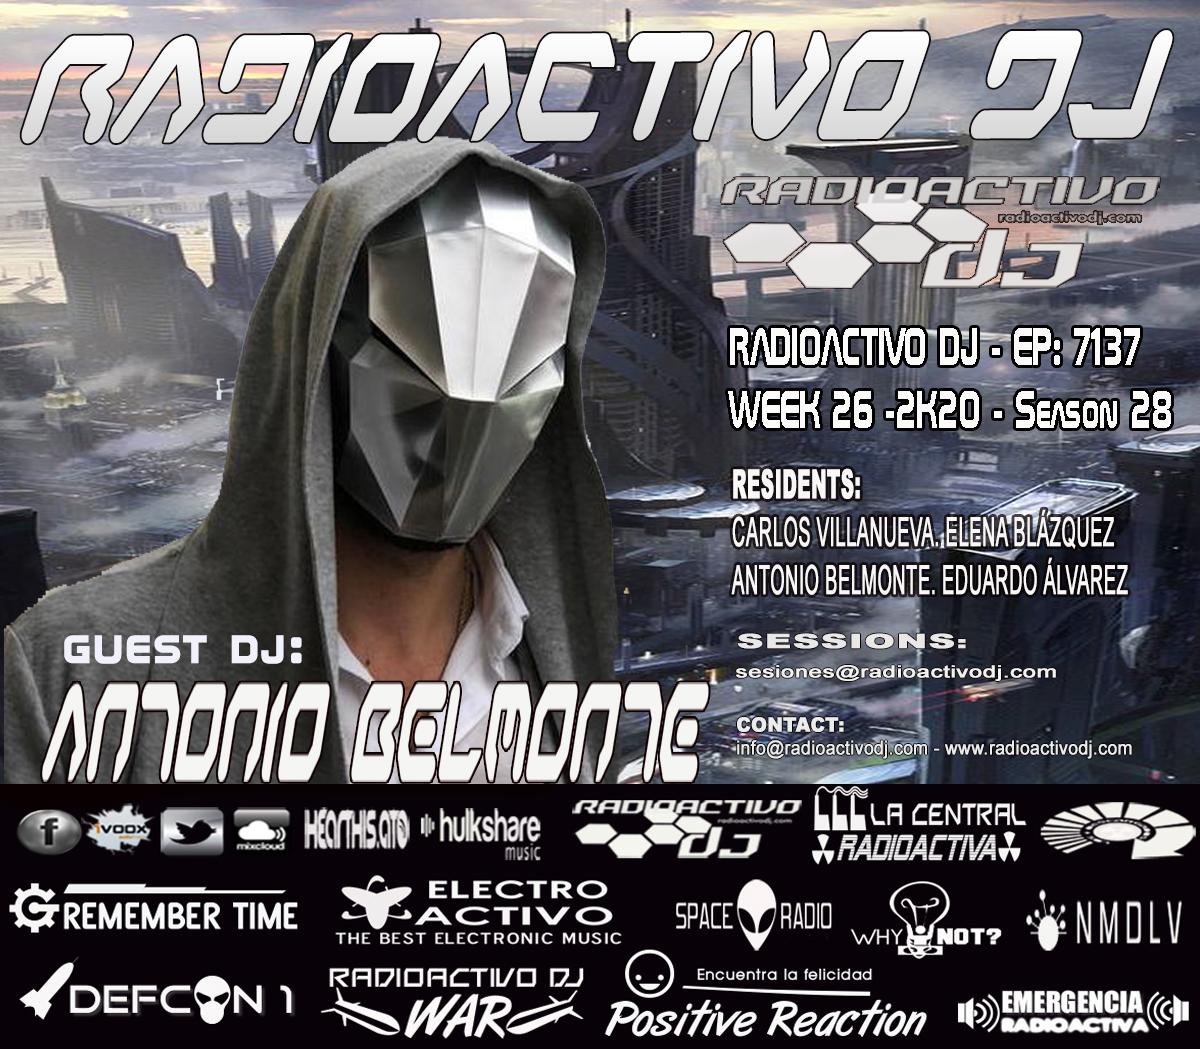 RADIOACTIVO-DJ-26-2020